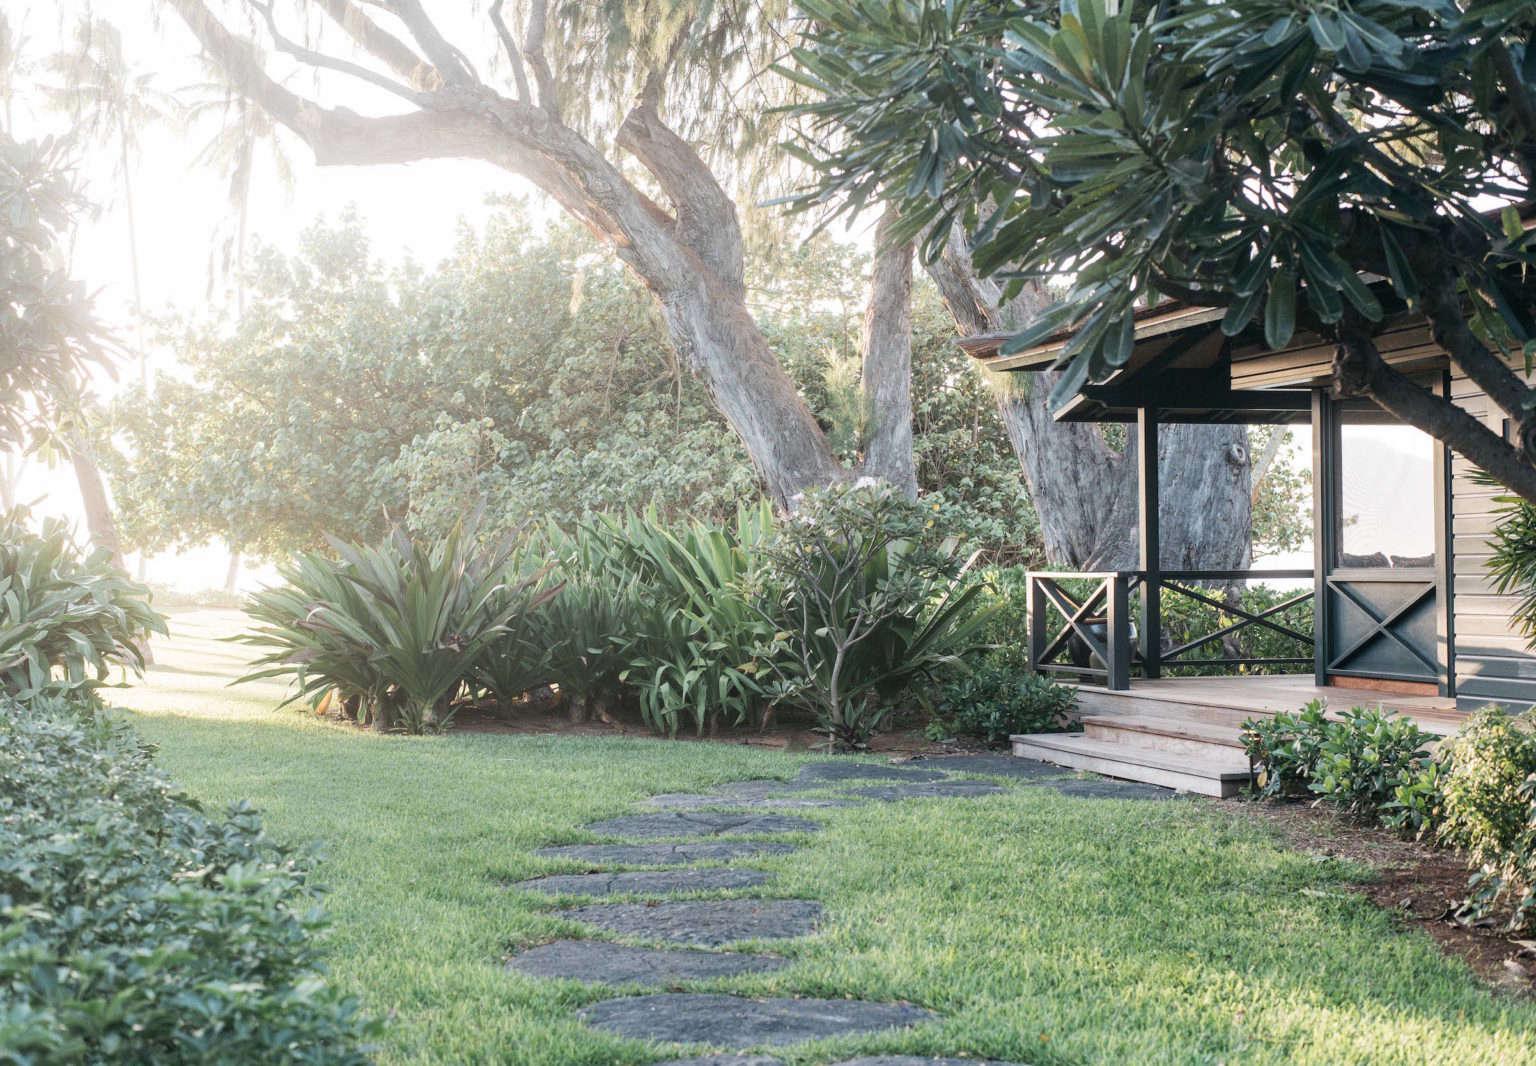 vacation rental maui beach cottage with a tropical garden the rh organized home com maui beach homes maui beach cottage rental